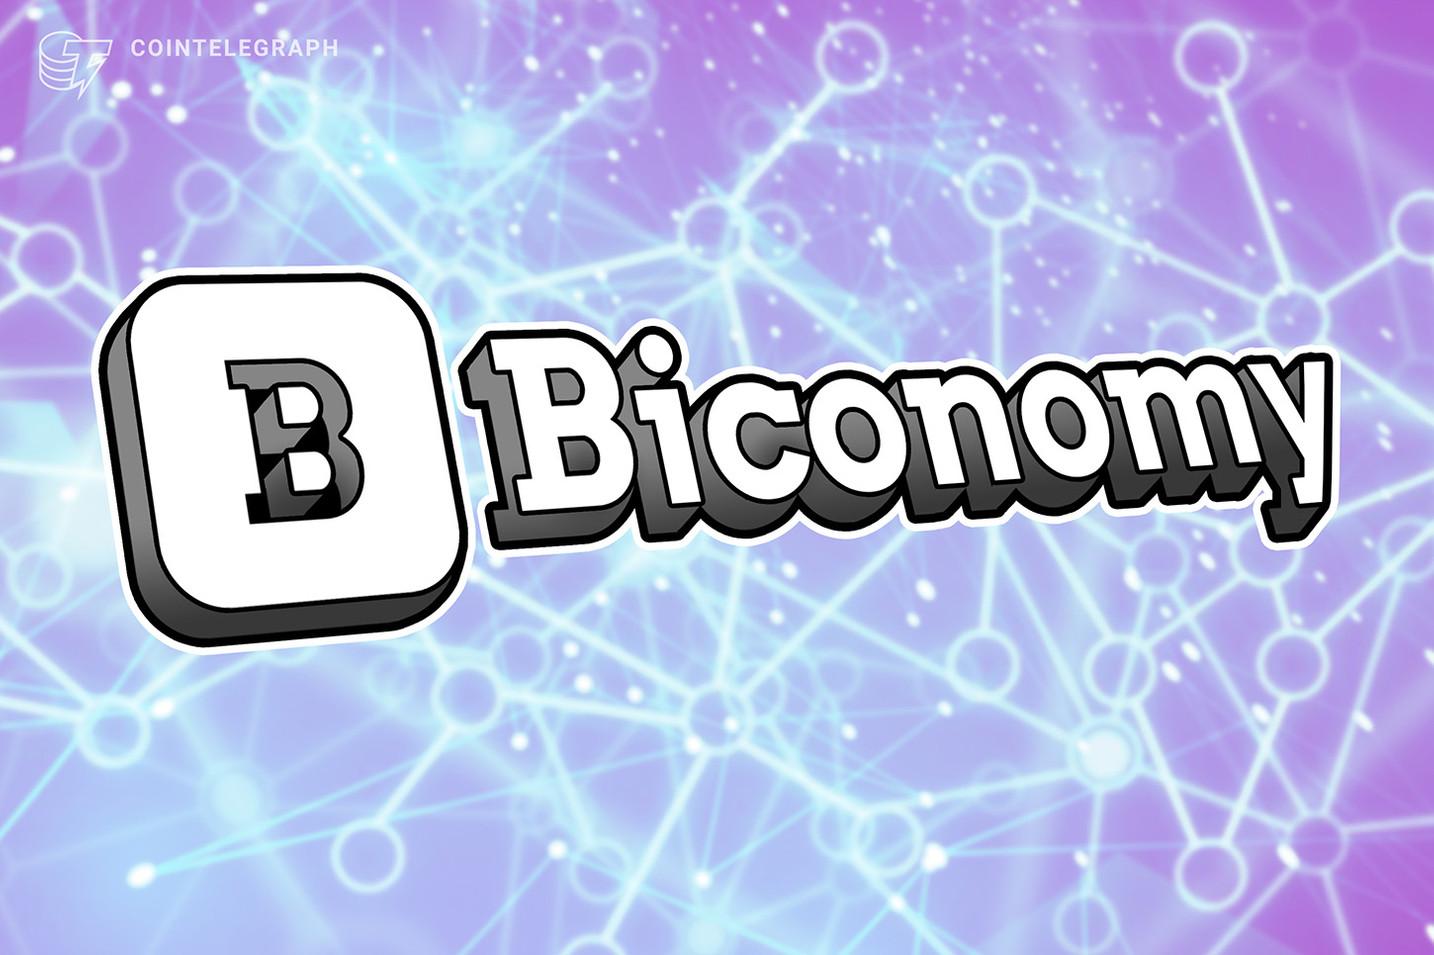 Biconomy presents gasless transactions on Arbitrum